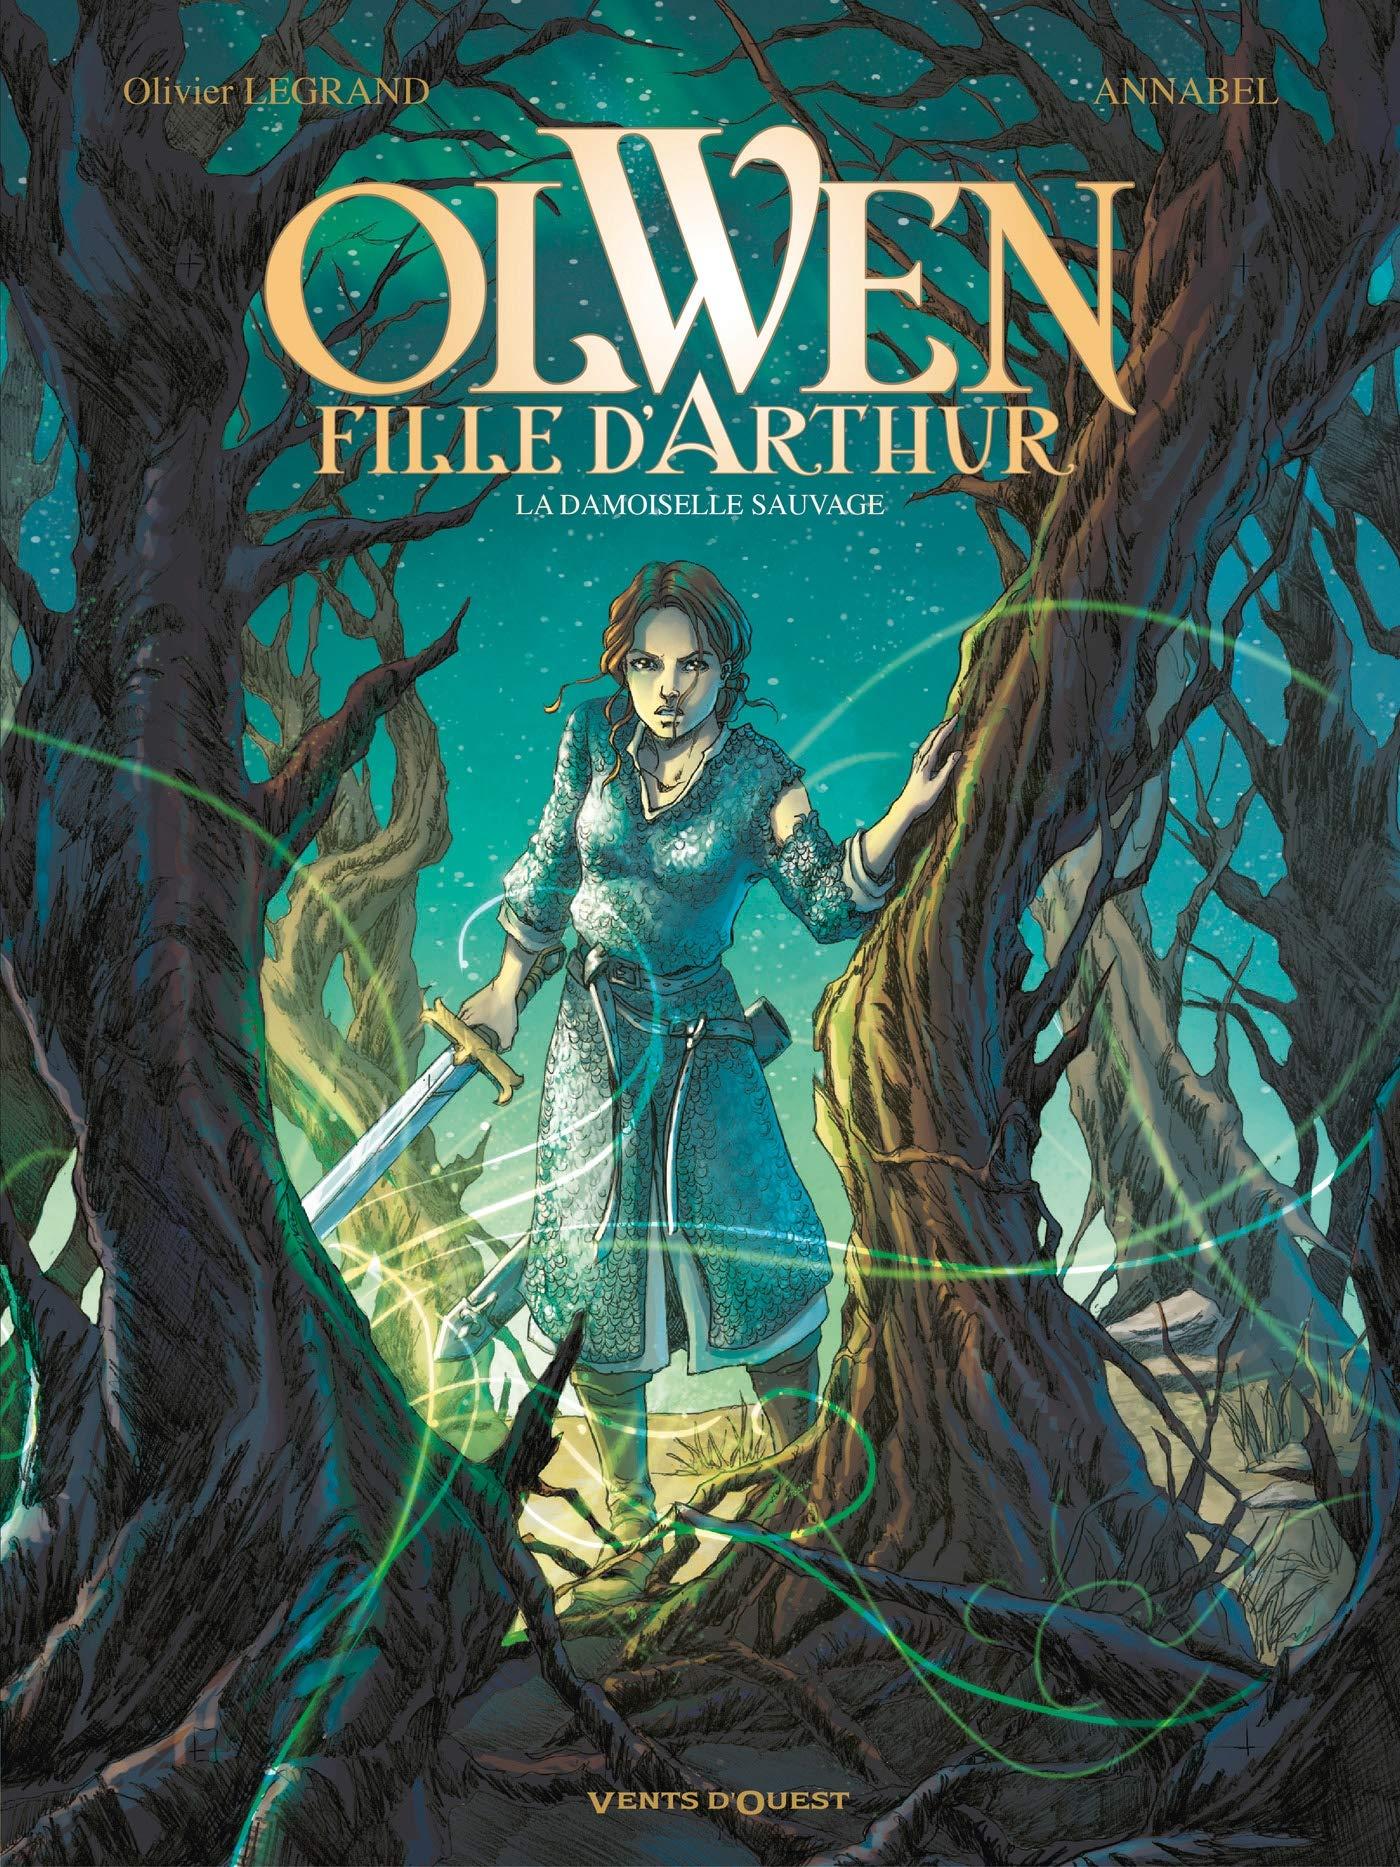 Olwen, fille d'Arthur 1 - La damoiselle Sauvage